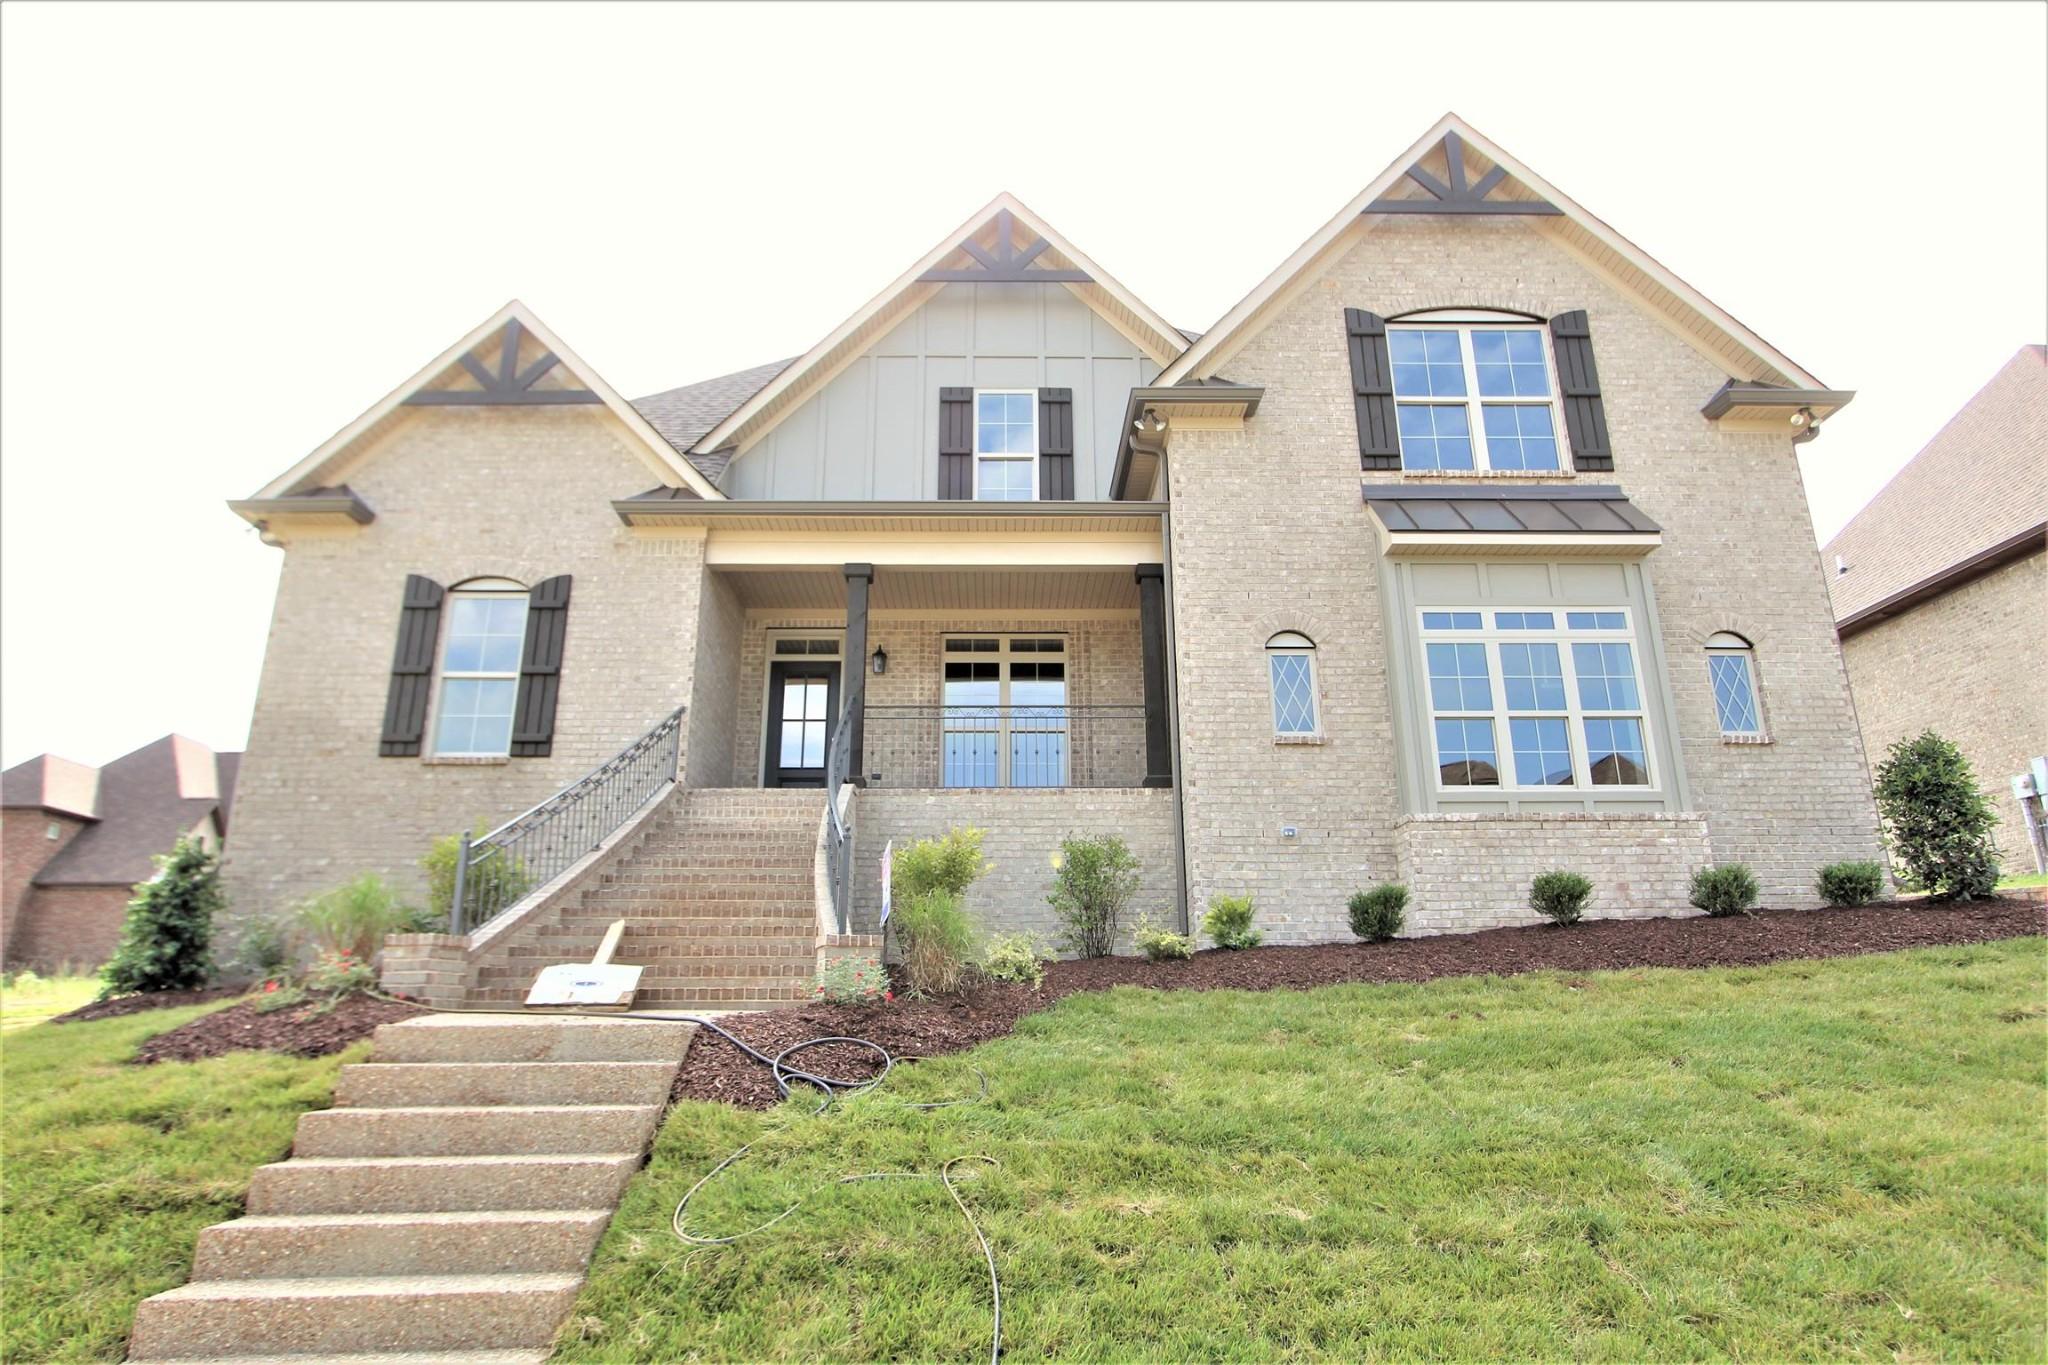 441 Whitley Way #240-C, Mount Juliet, TN 37122 - Mount Juliet, TN real estate listing